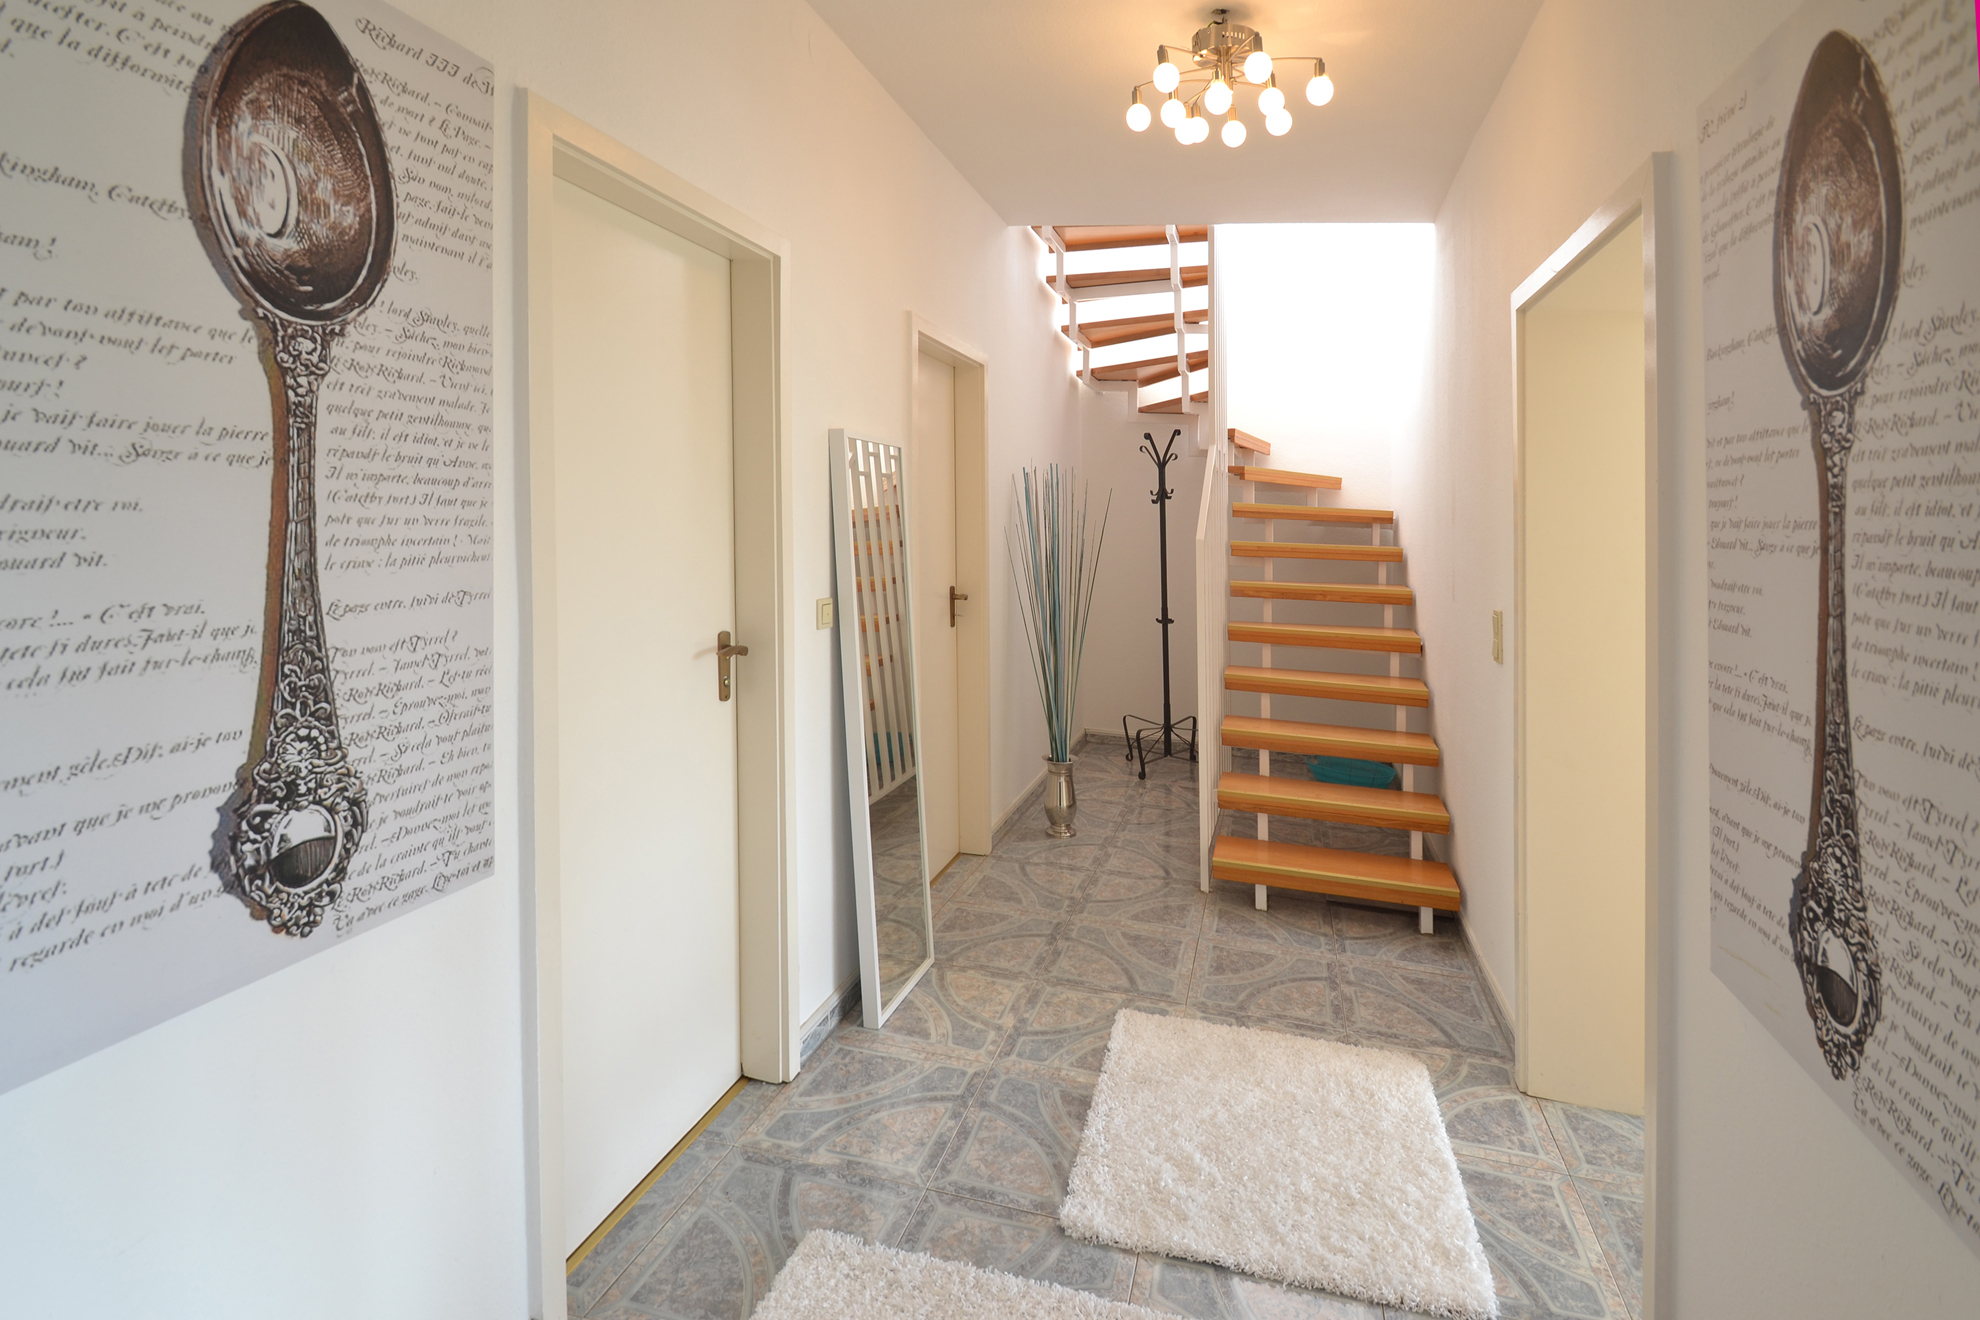 penthouse in der sonnenallee homestaging in berlin. Black Bedroom Furniture Sets. Home Design Ideas